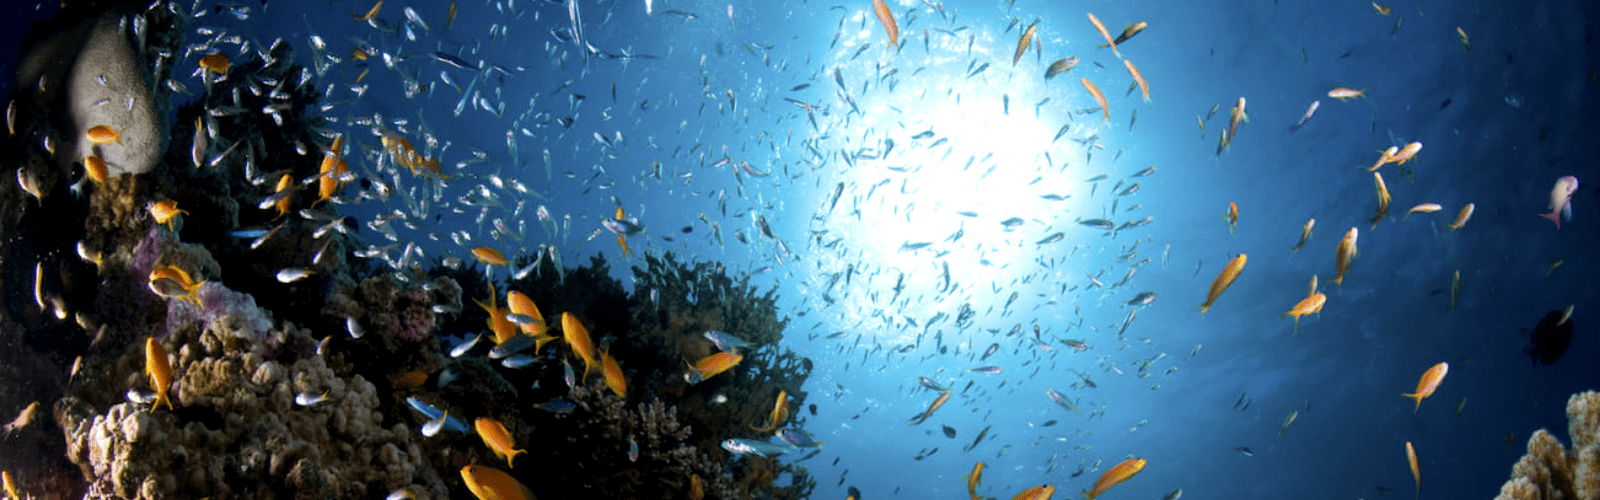 Scuba Diving in Sharm